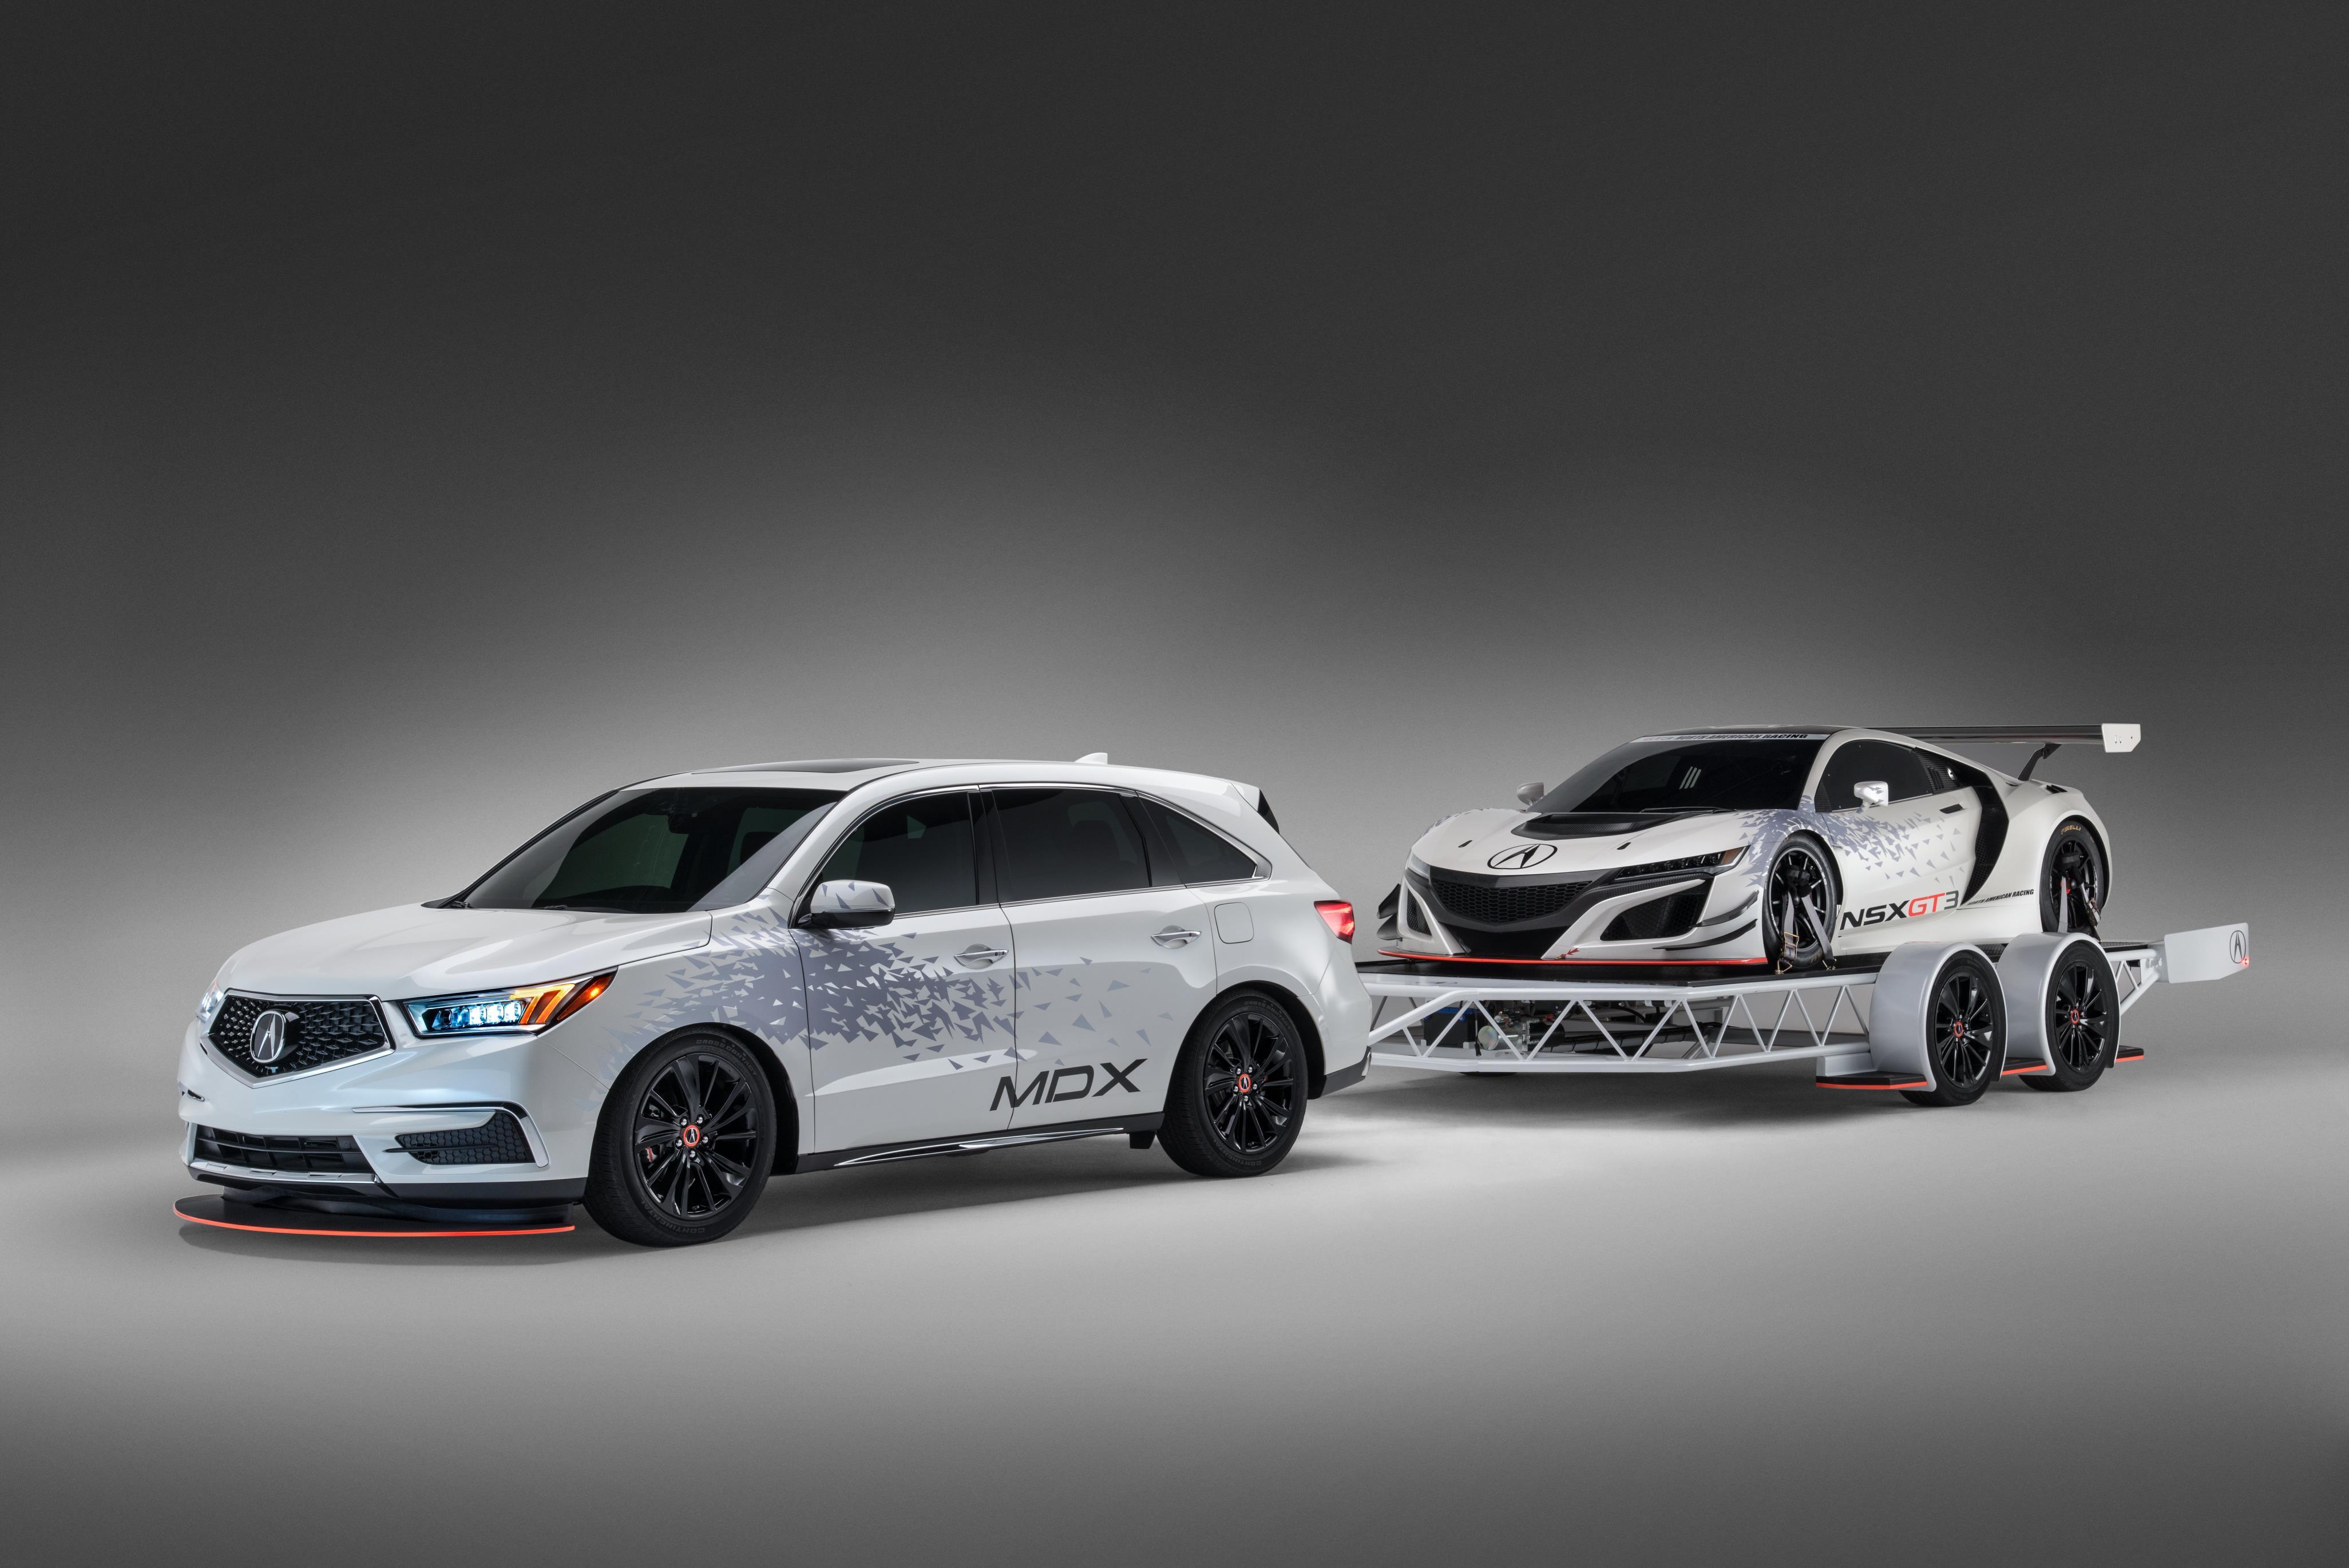 Custom Acura Mdx Towing Nsx Gt3 On Special Sema Trailer Autoevolution